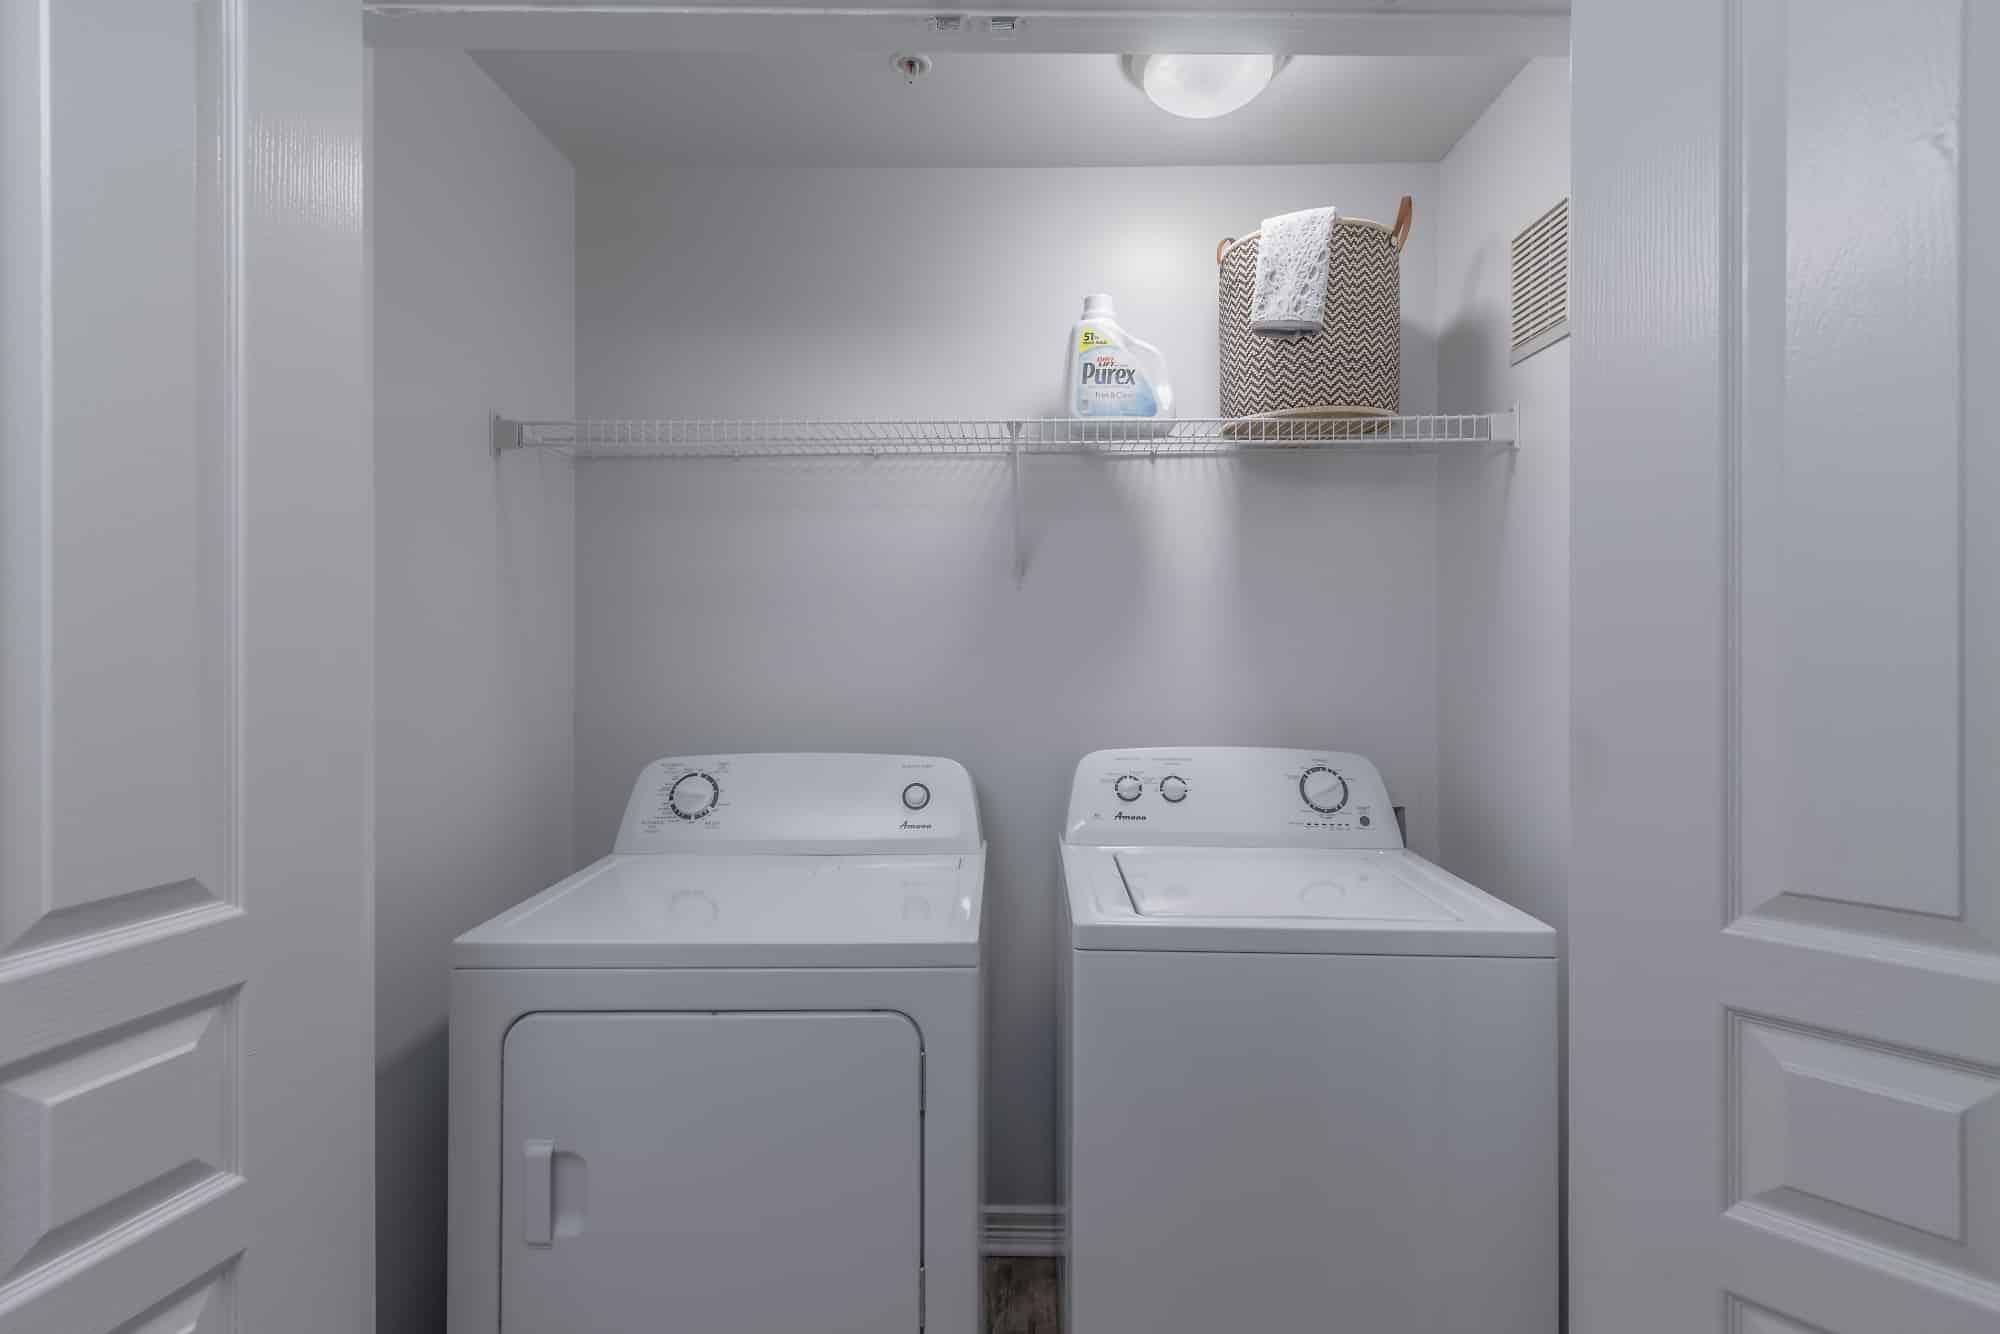 Livingston Washer Dryer The